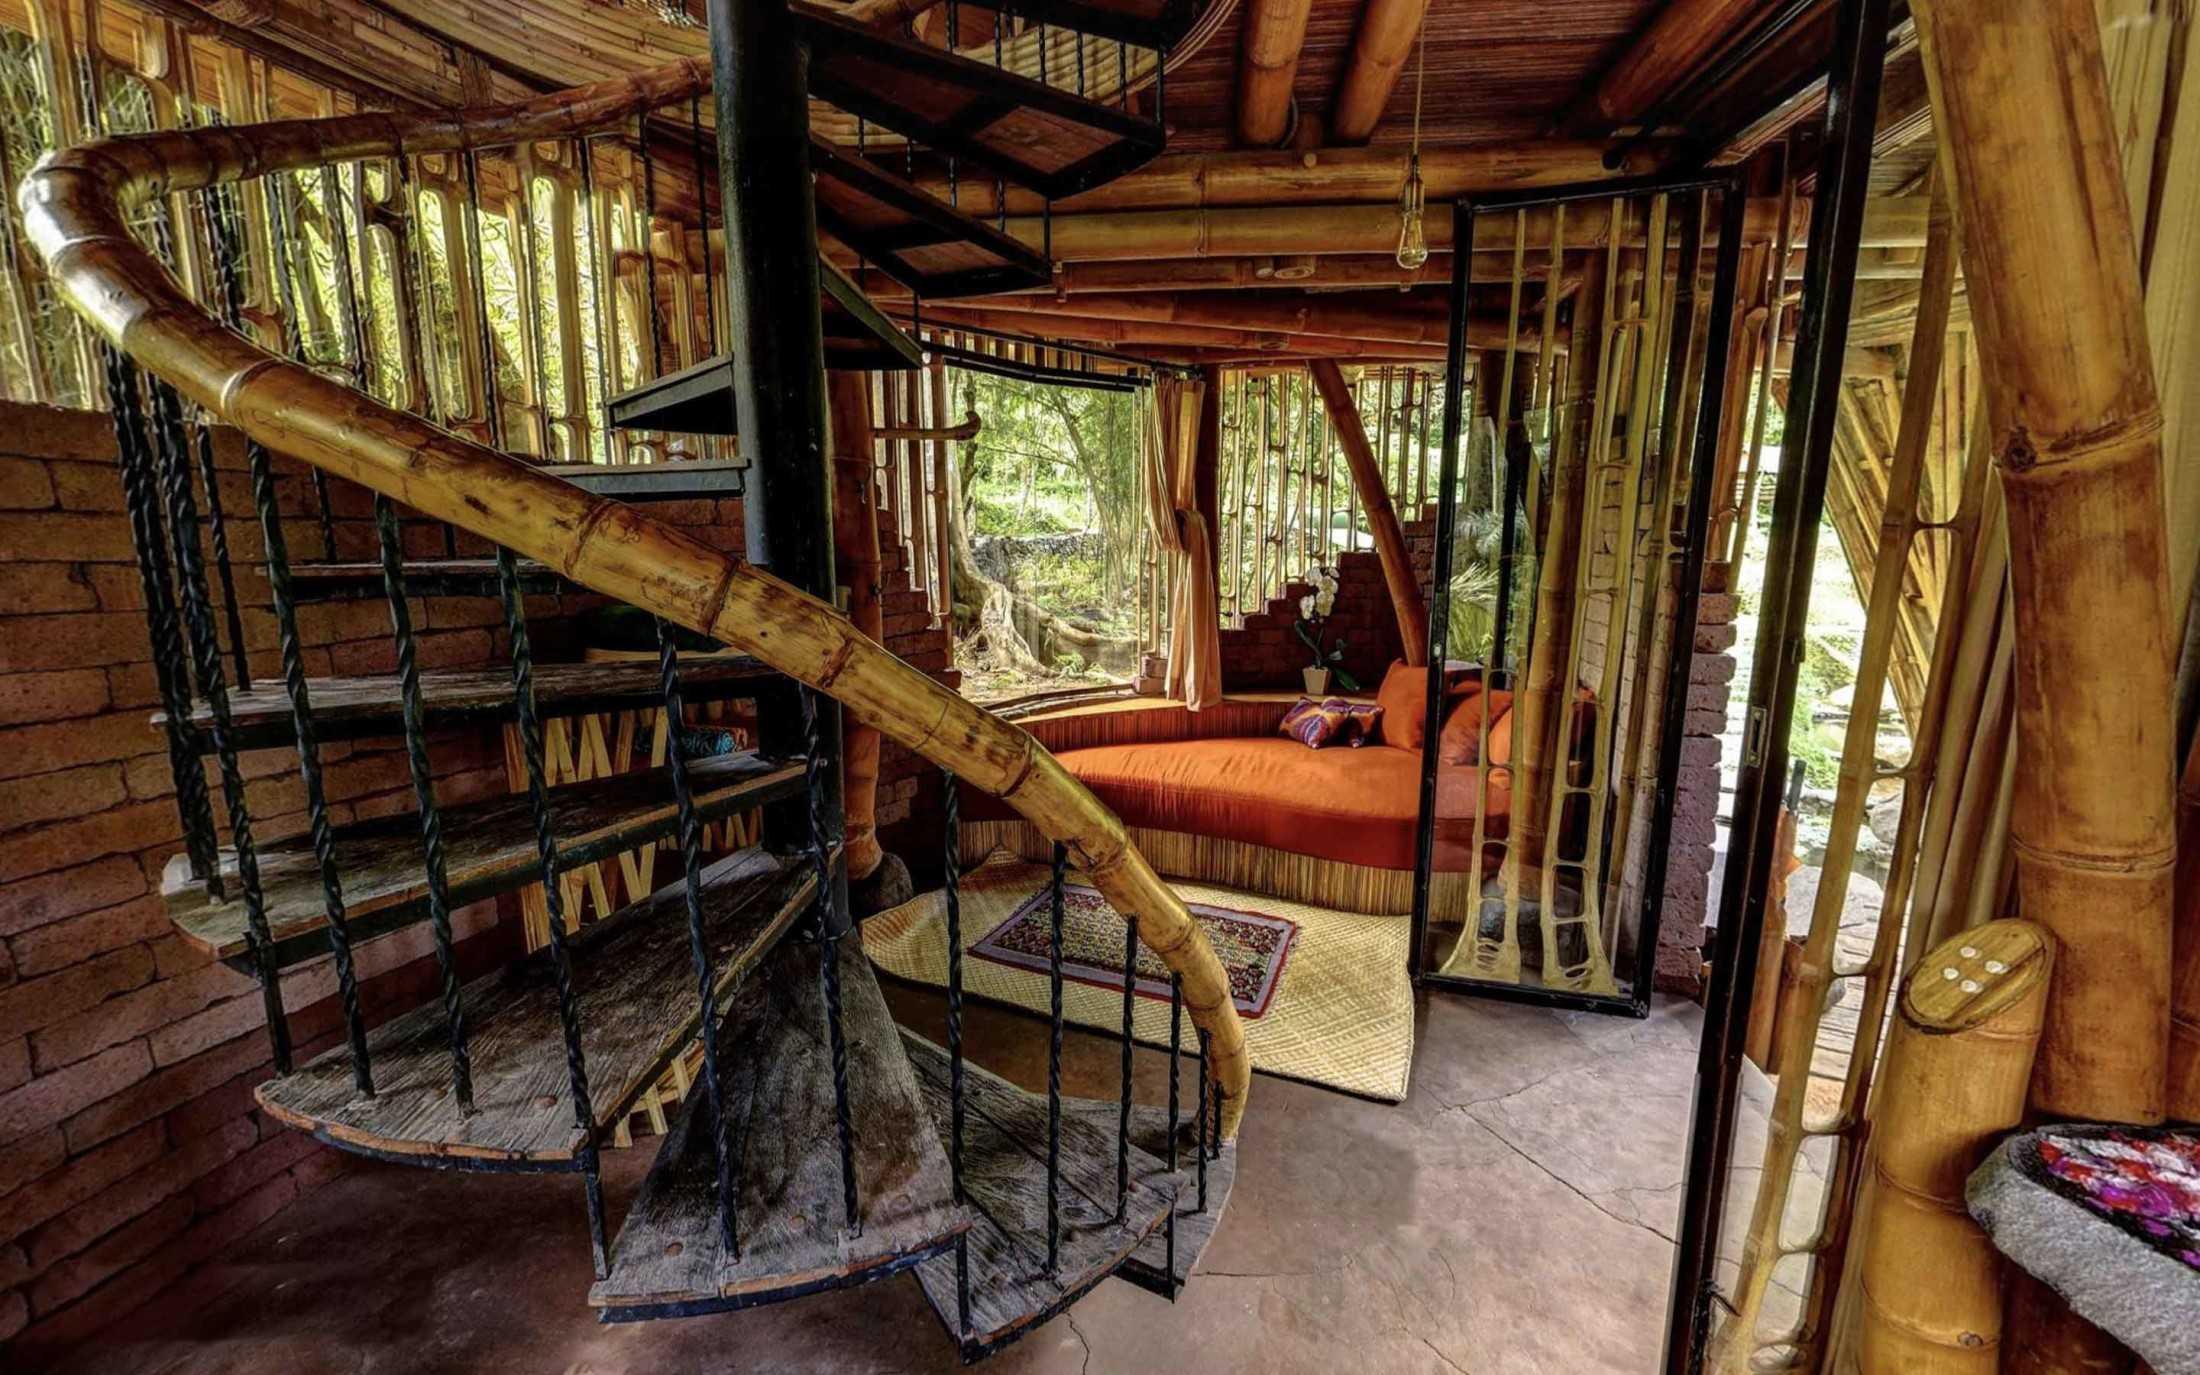 Agung Budi Raharsa | Architecture & Engineering Riverbend Bamboo House - Bali Bali, Indonesia Bali, Indonesia Agung-Budi-Raharsa-Riverbend-House-Bali  88721